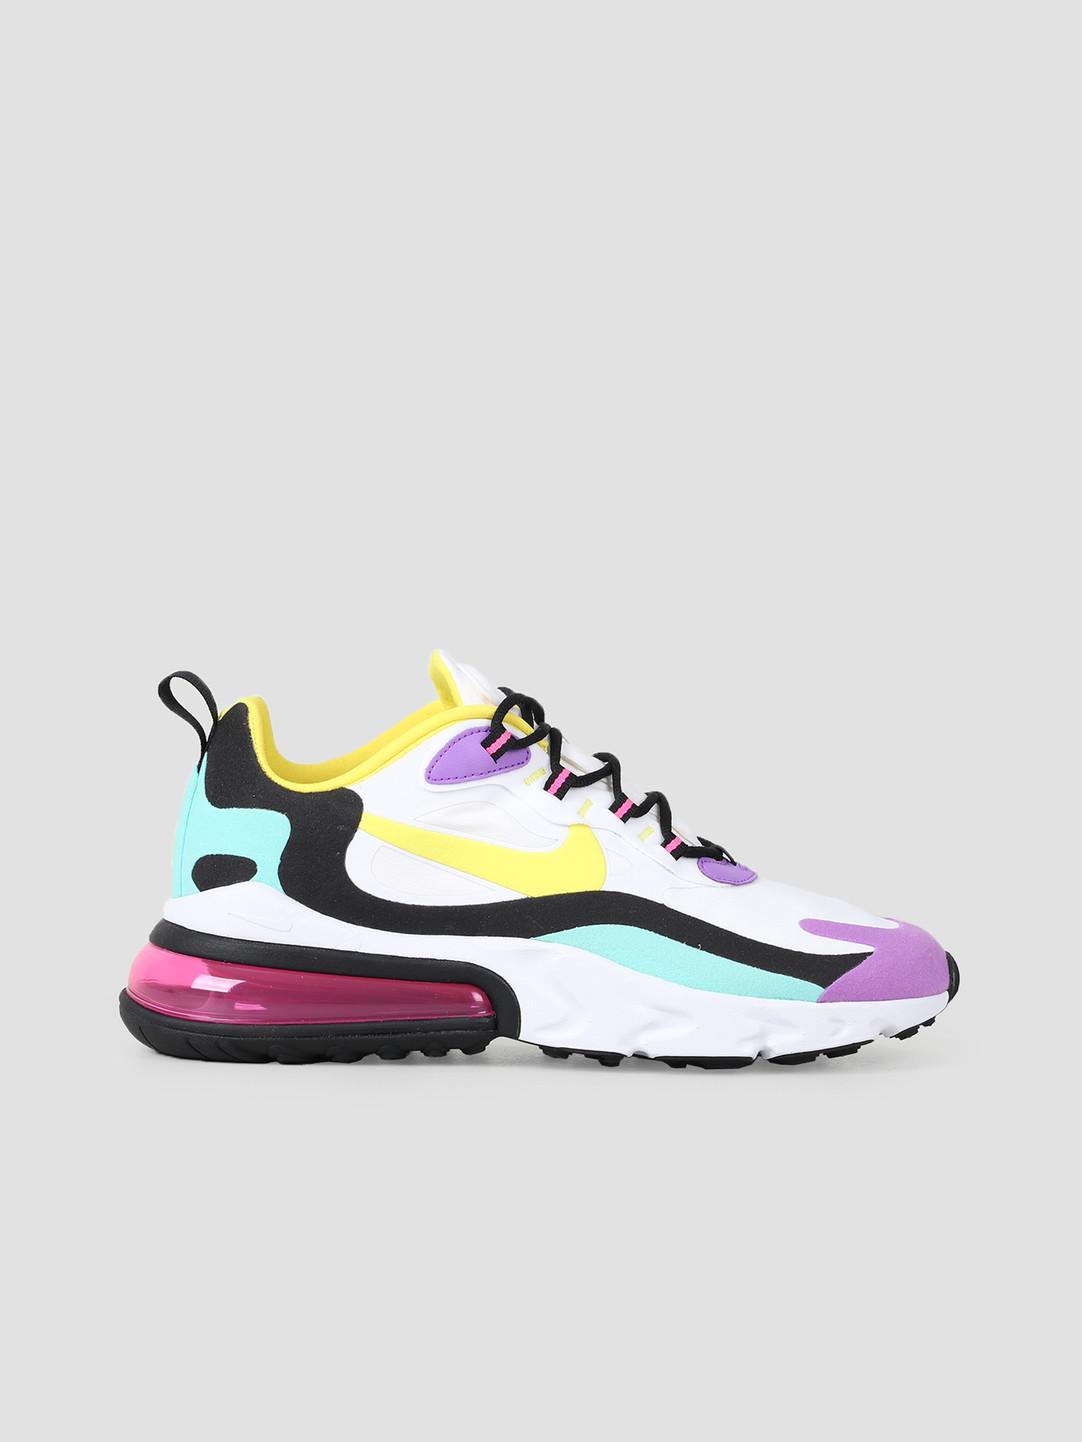 Nike Air Max 270 React (Geometric Art) White Dynamic Yellow Black | A04971 101